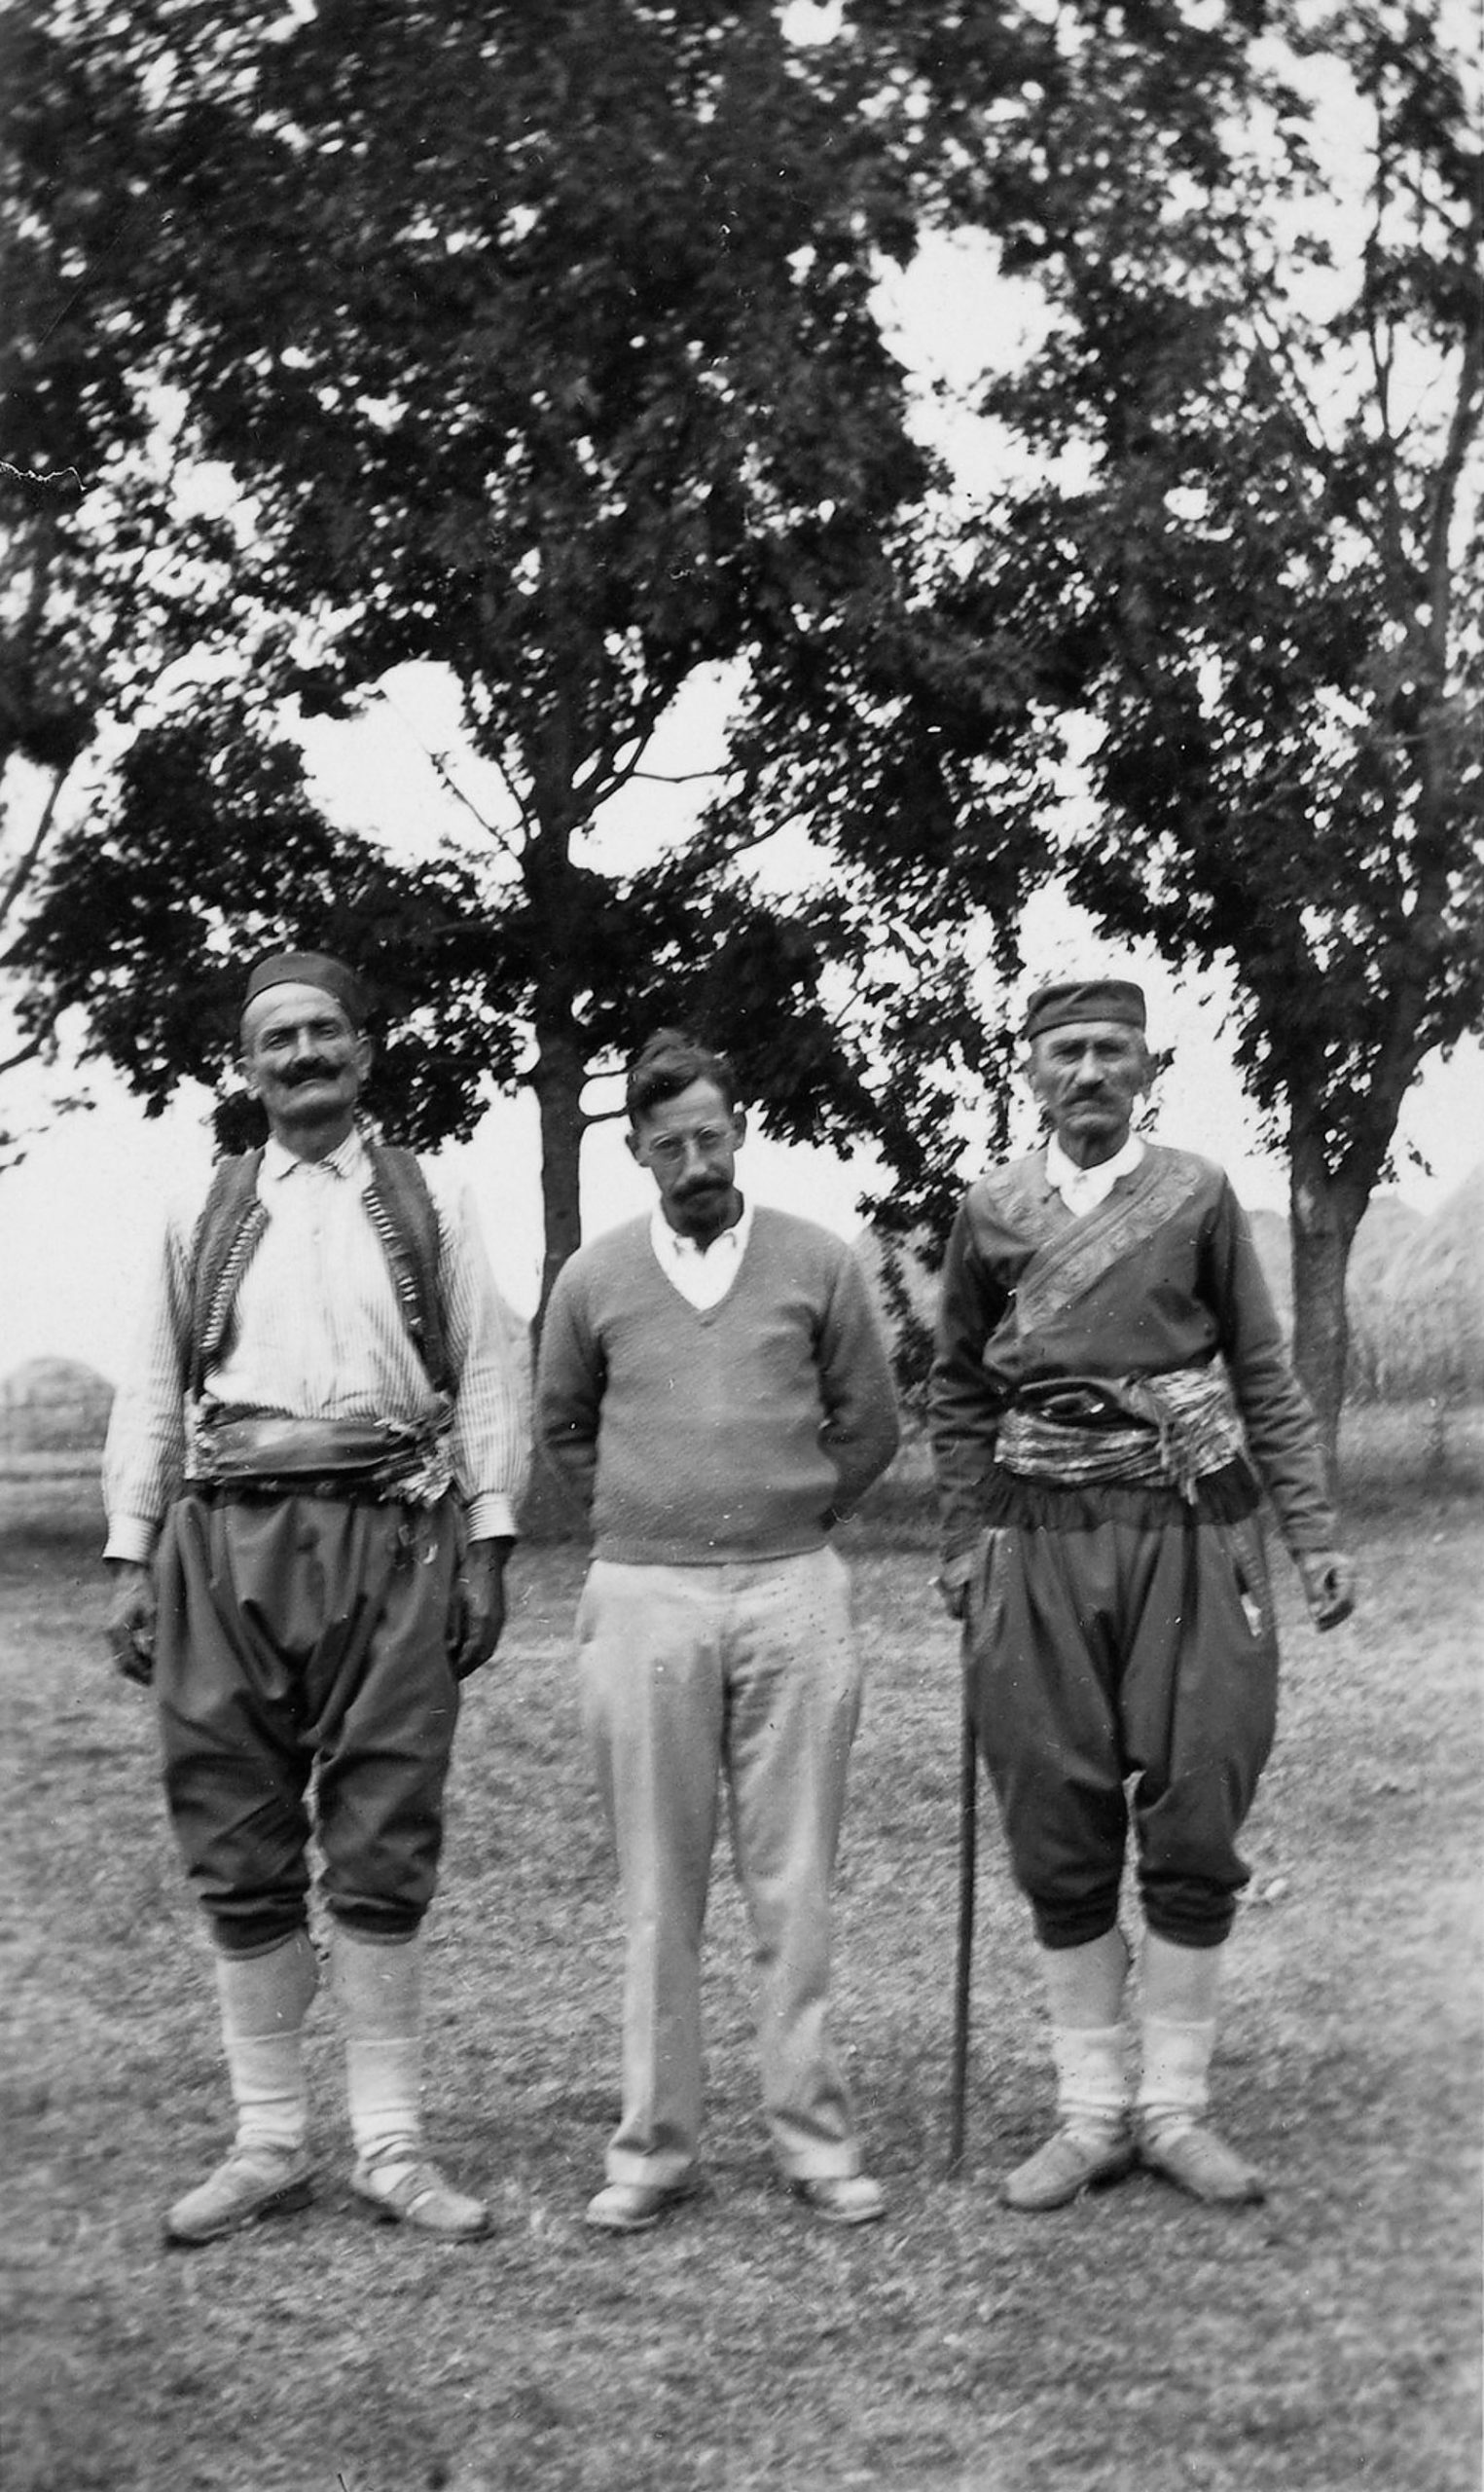 Milman Parry with singers Jovan Govedarica and Mićo Savić